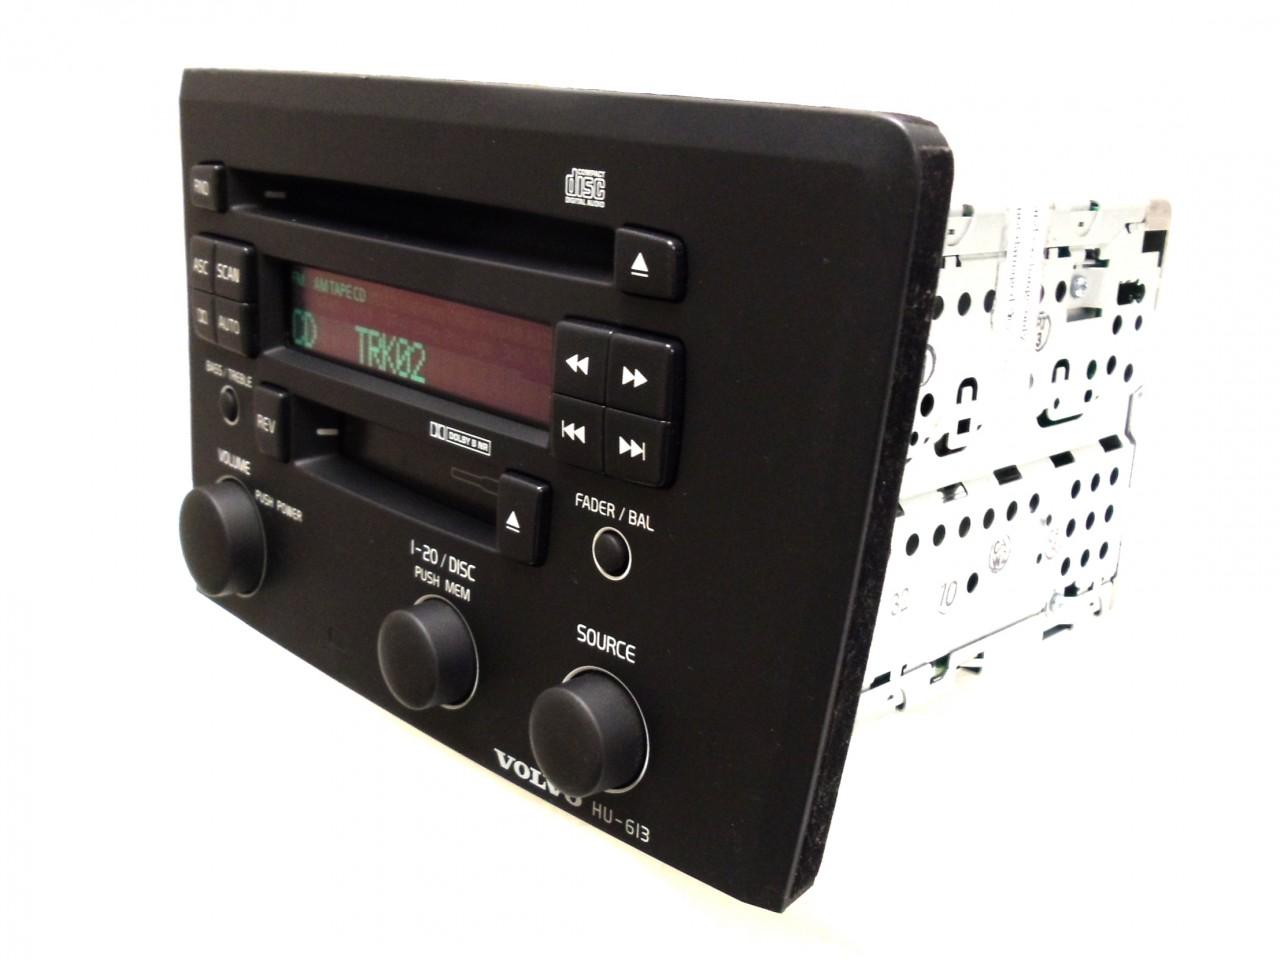 2004 Volvo S60 V70 XC70 HU-613 Radio AM//FM CD Player Head Unit 36050163